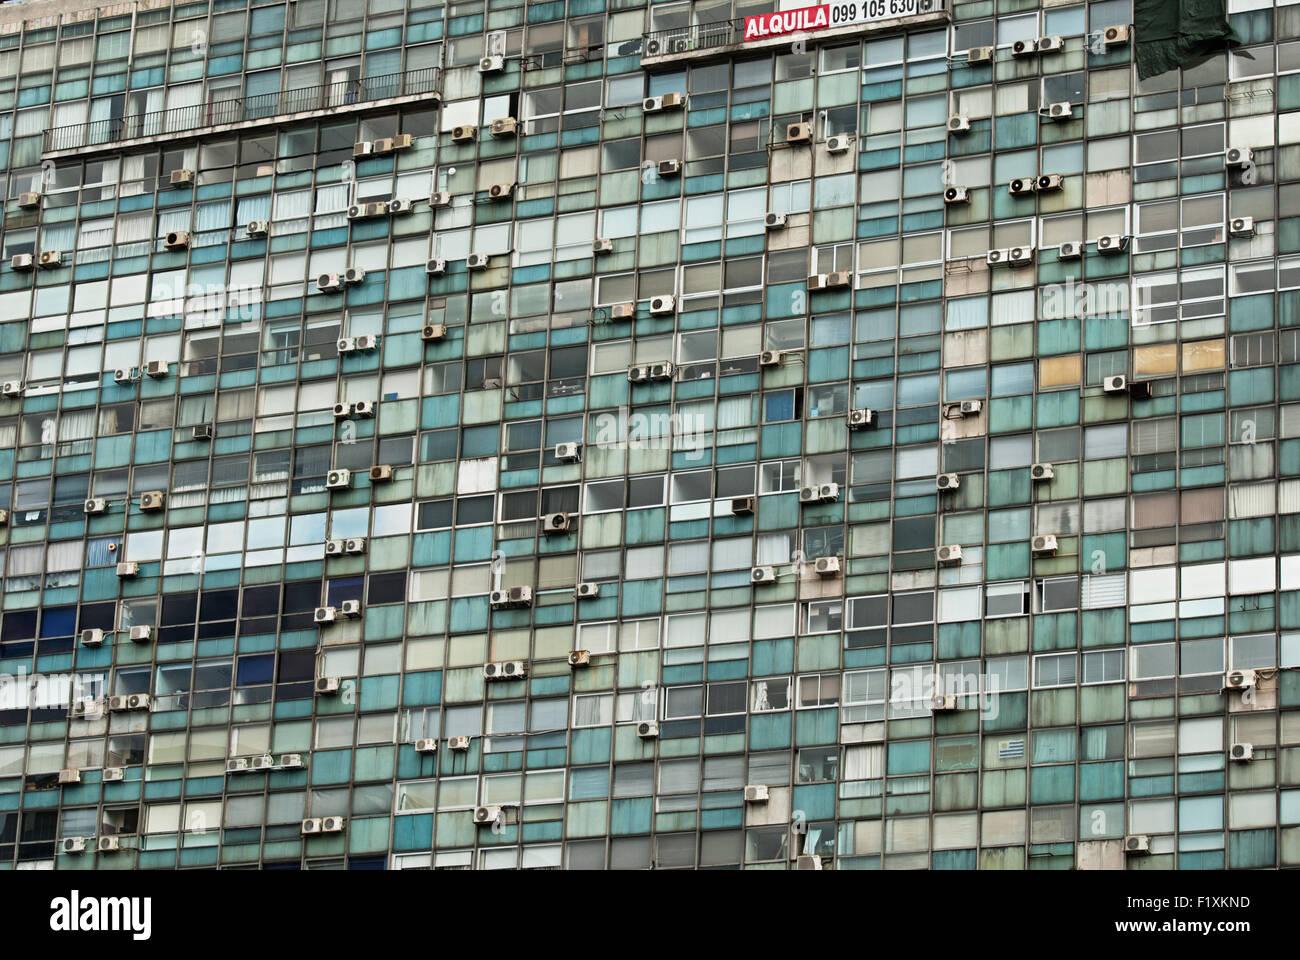 Montevideo, Uruguay, architecture - Stock Image